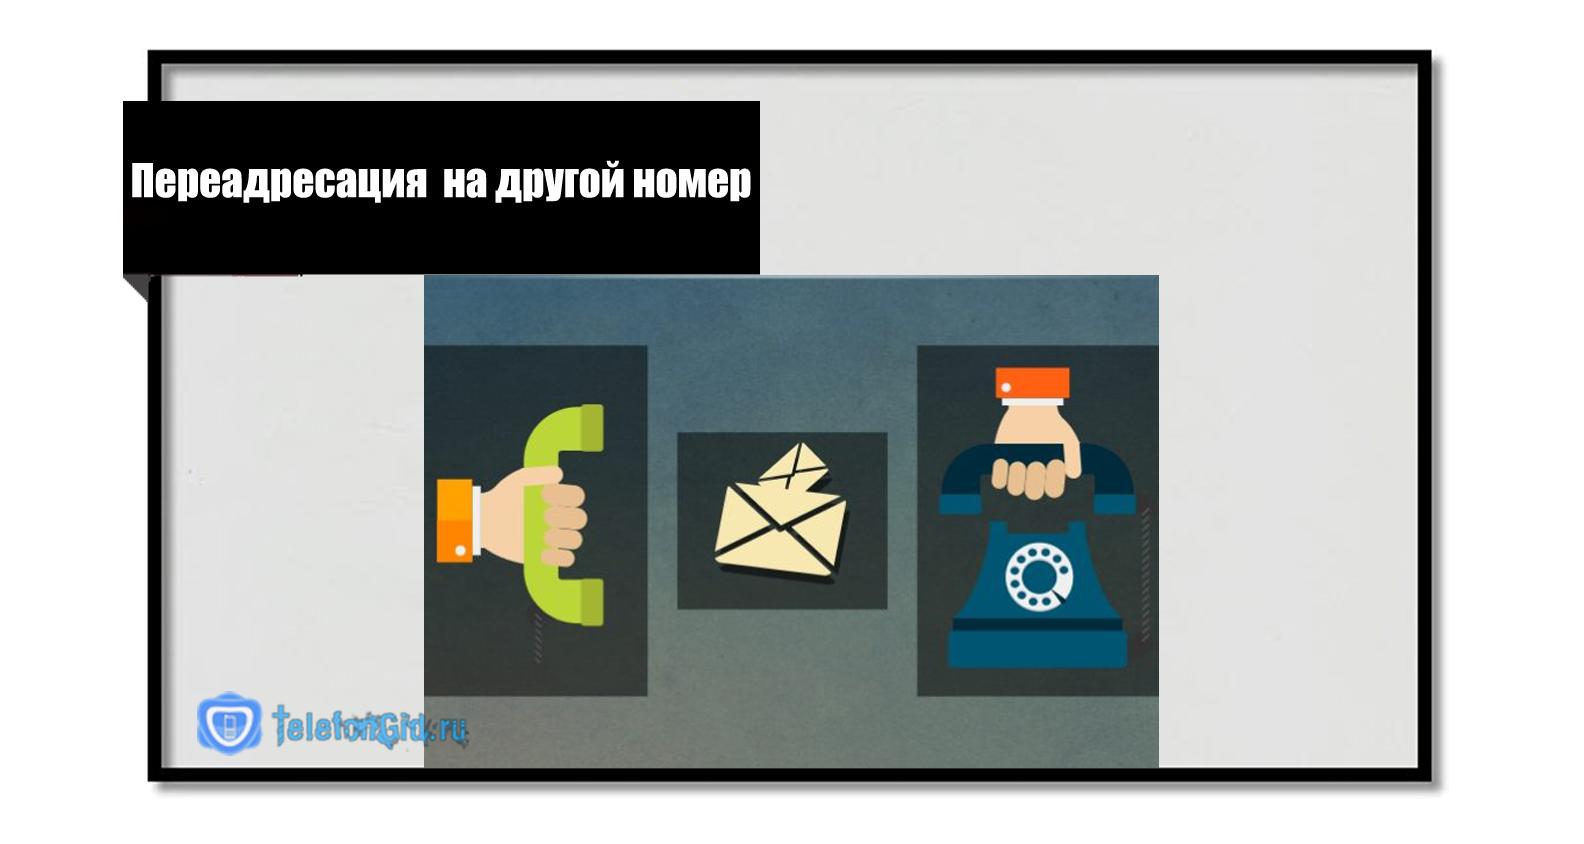 где взять 70000 рублей срочно без кредита